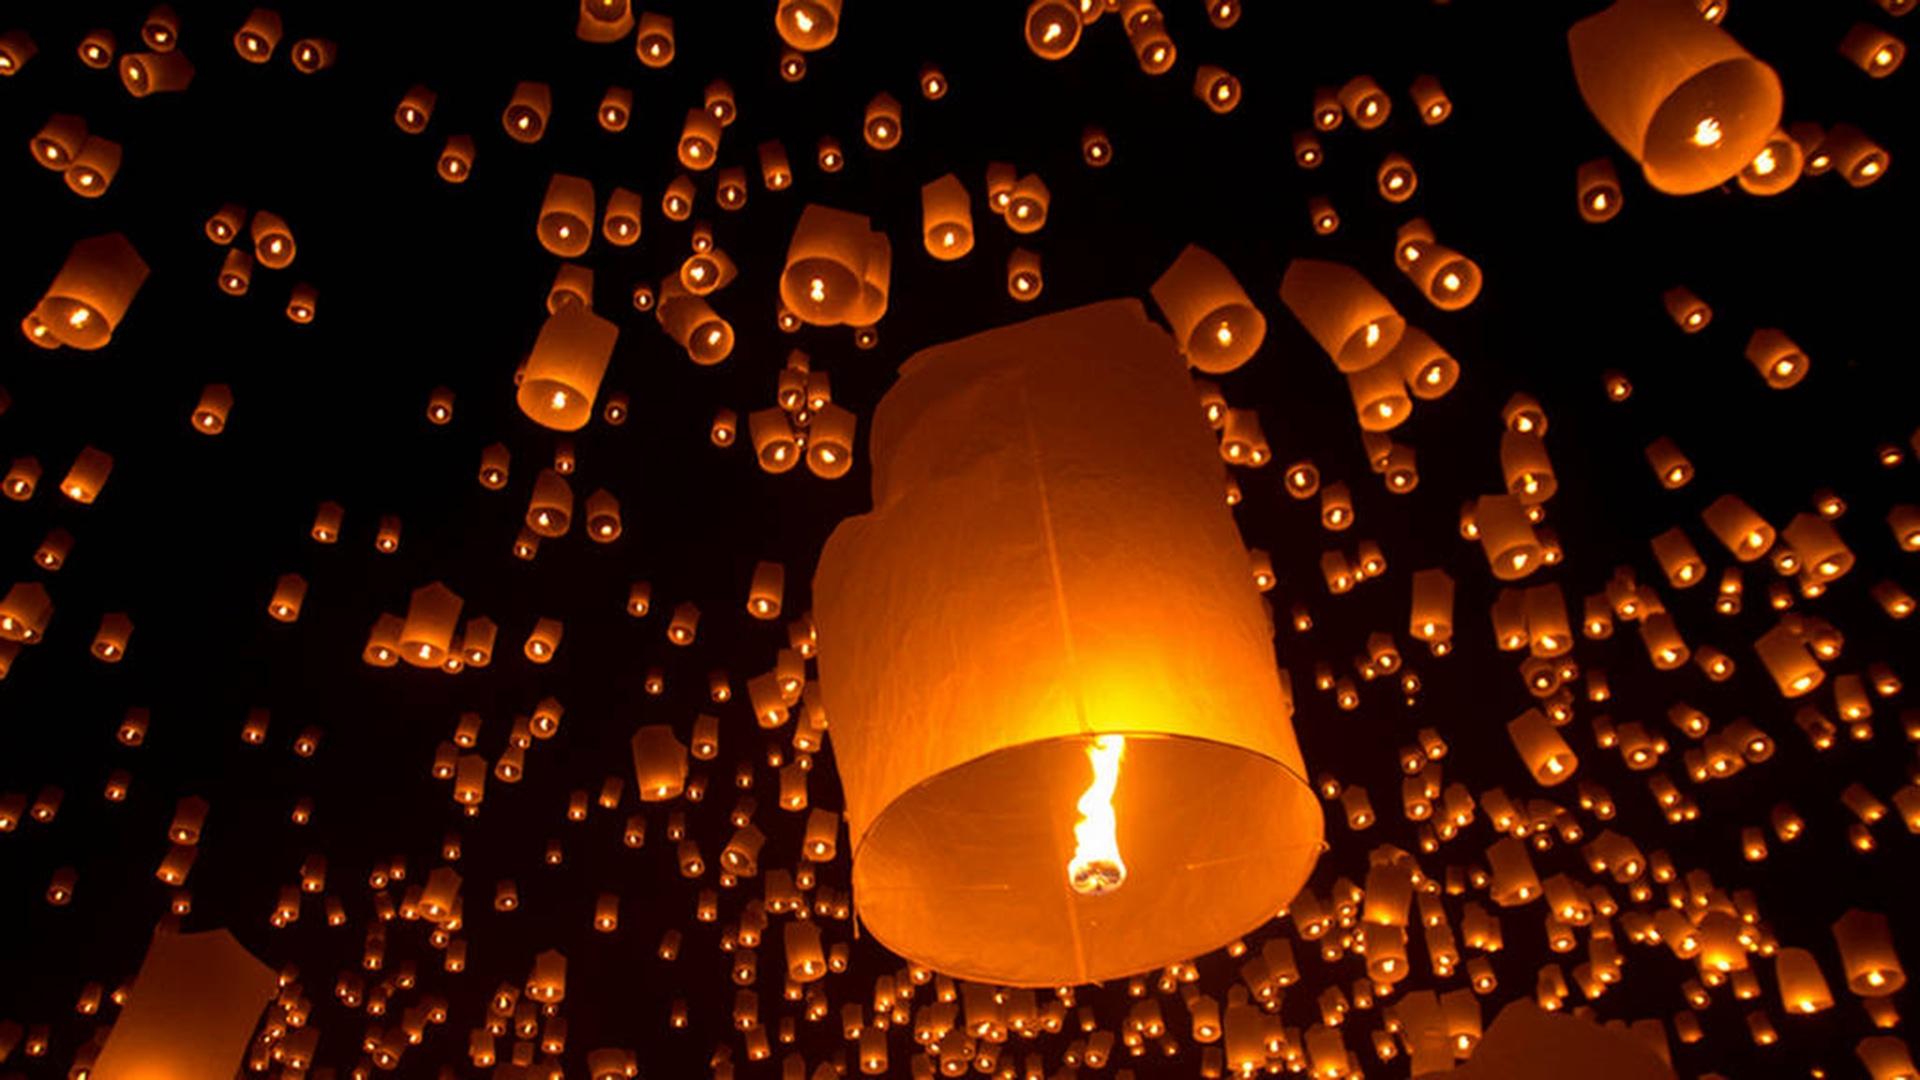 Lantern Wallpaper Posted By Ryan Johnson